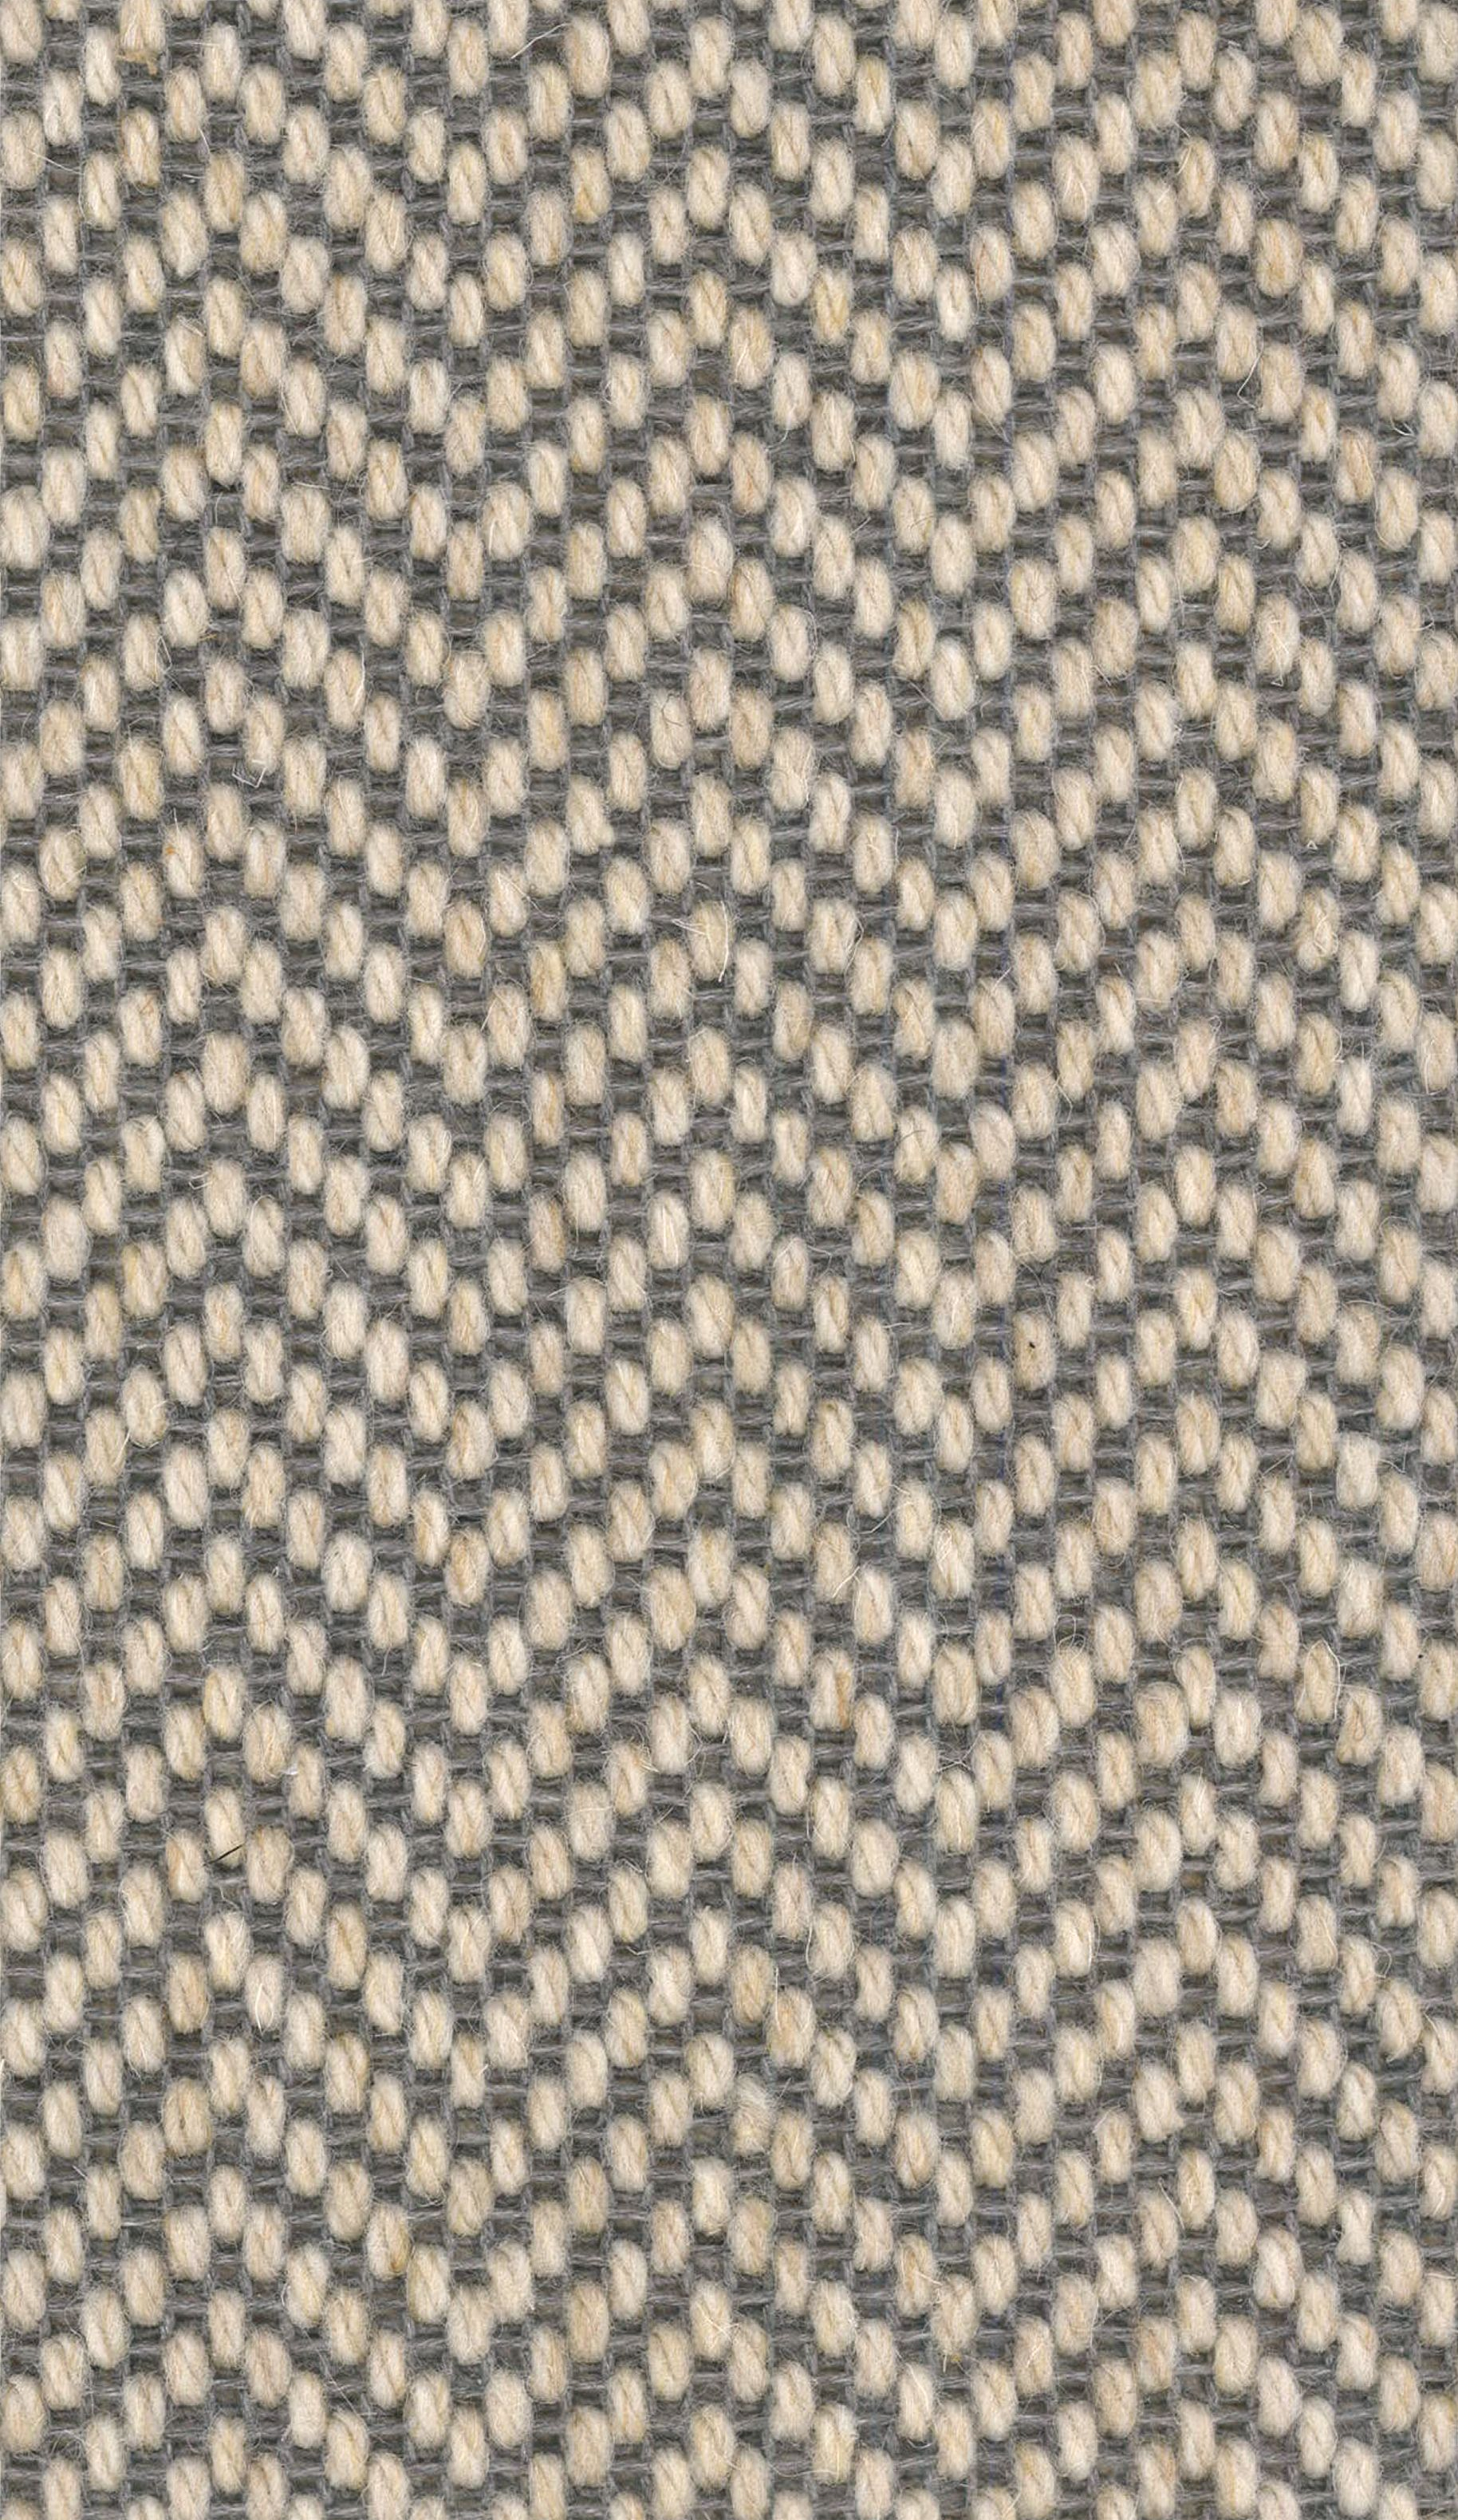 Herringbone Cortenaer Wool Carpet A Wool And Synthetic